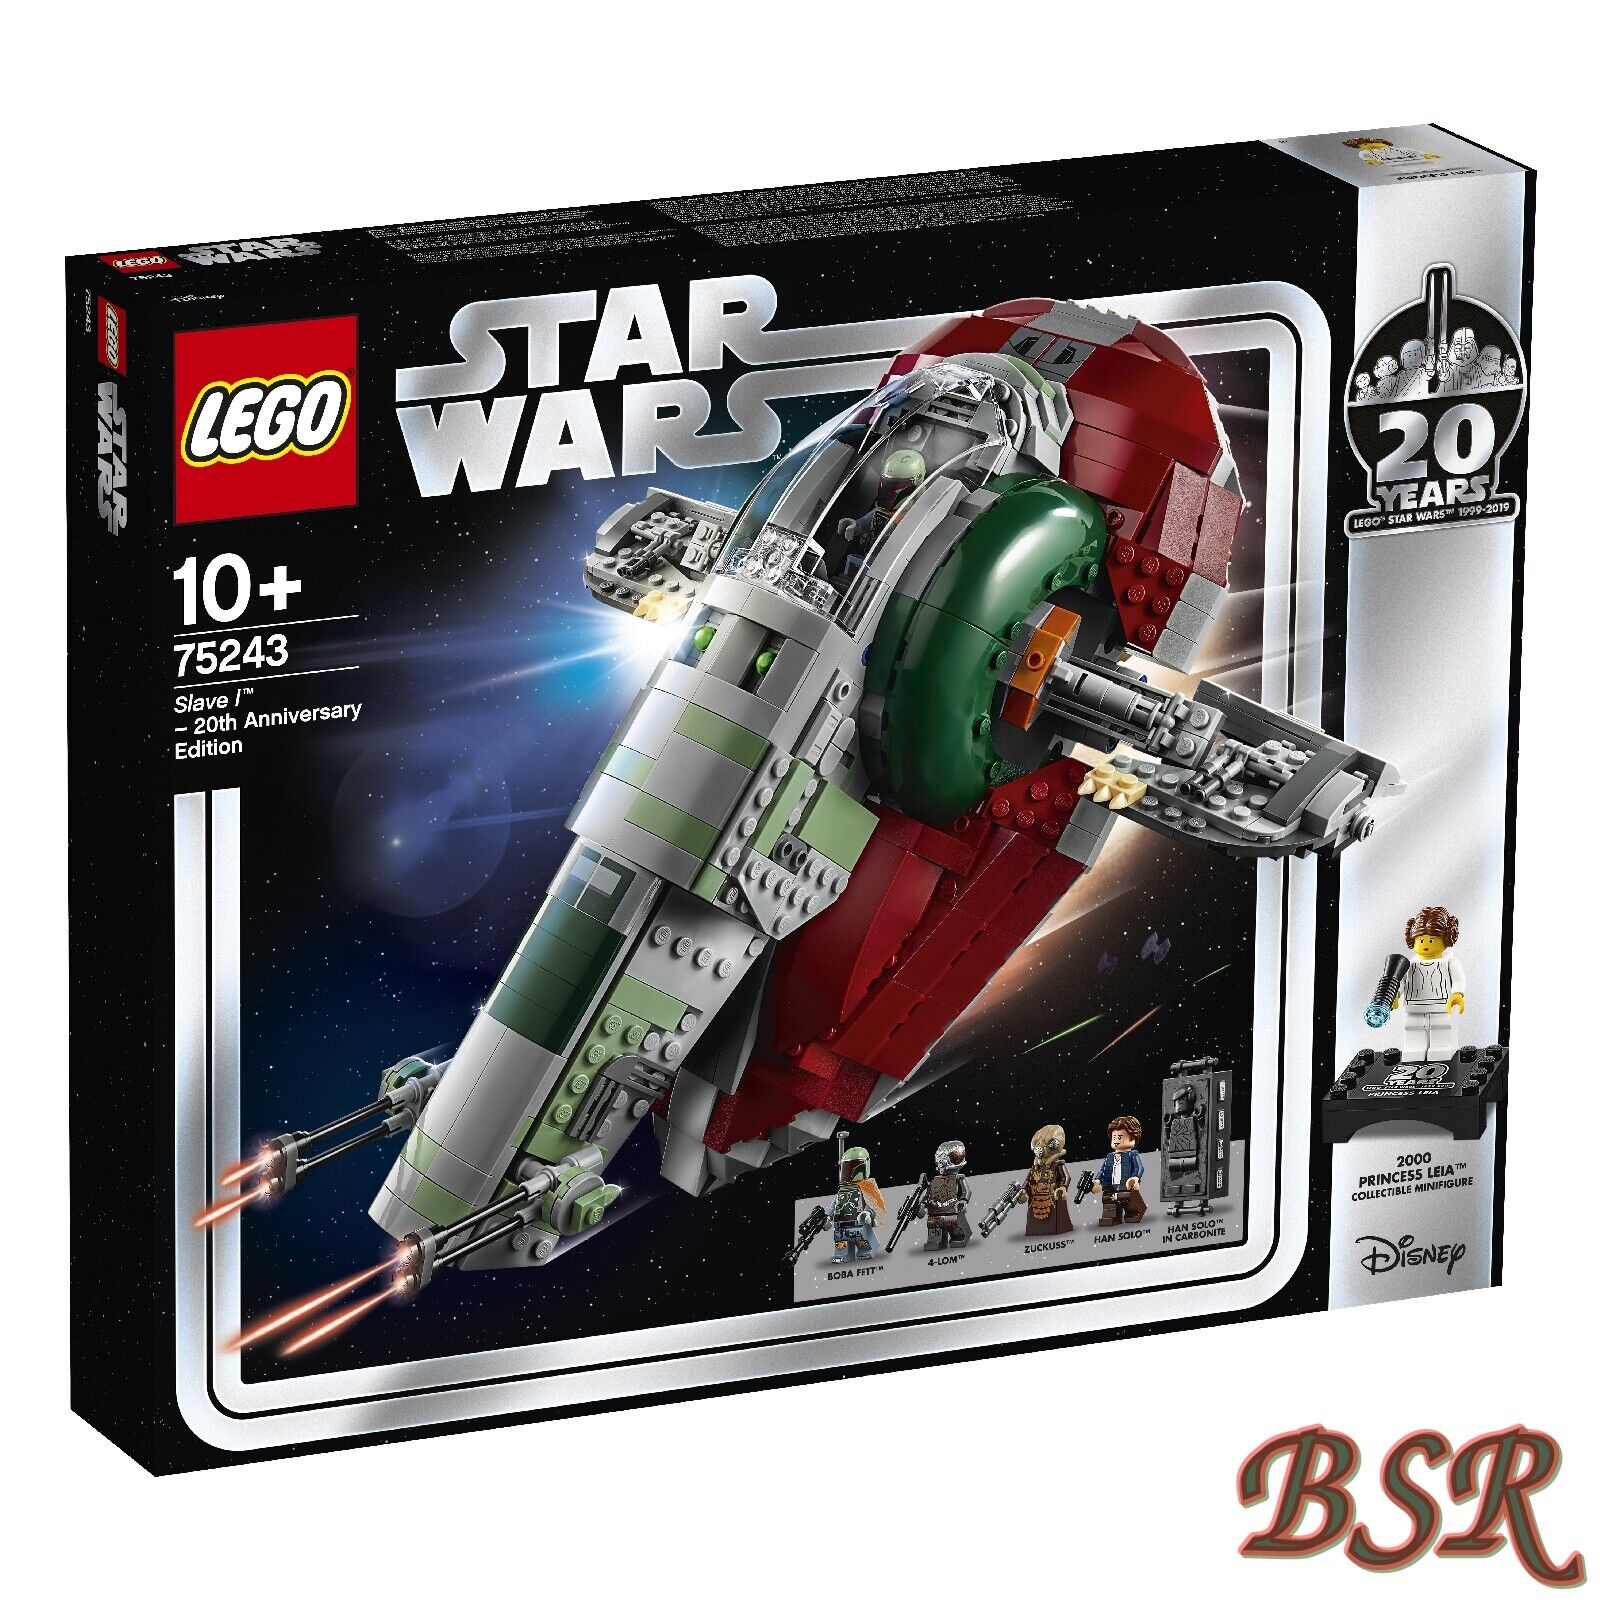 Réservations LEGO ® Star Wars ™  75243 Slave I ™ - 20 ans LEGO STAR WARS  Nouveau neuf dans sa boîte